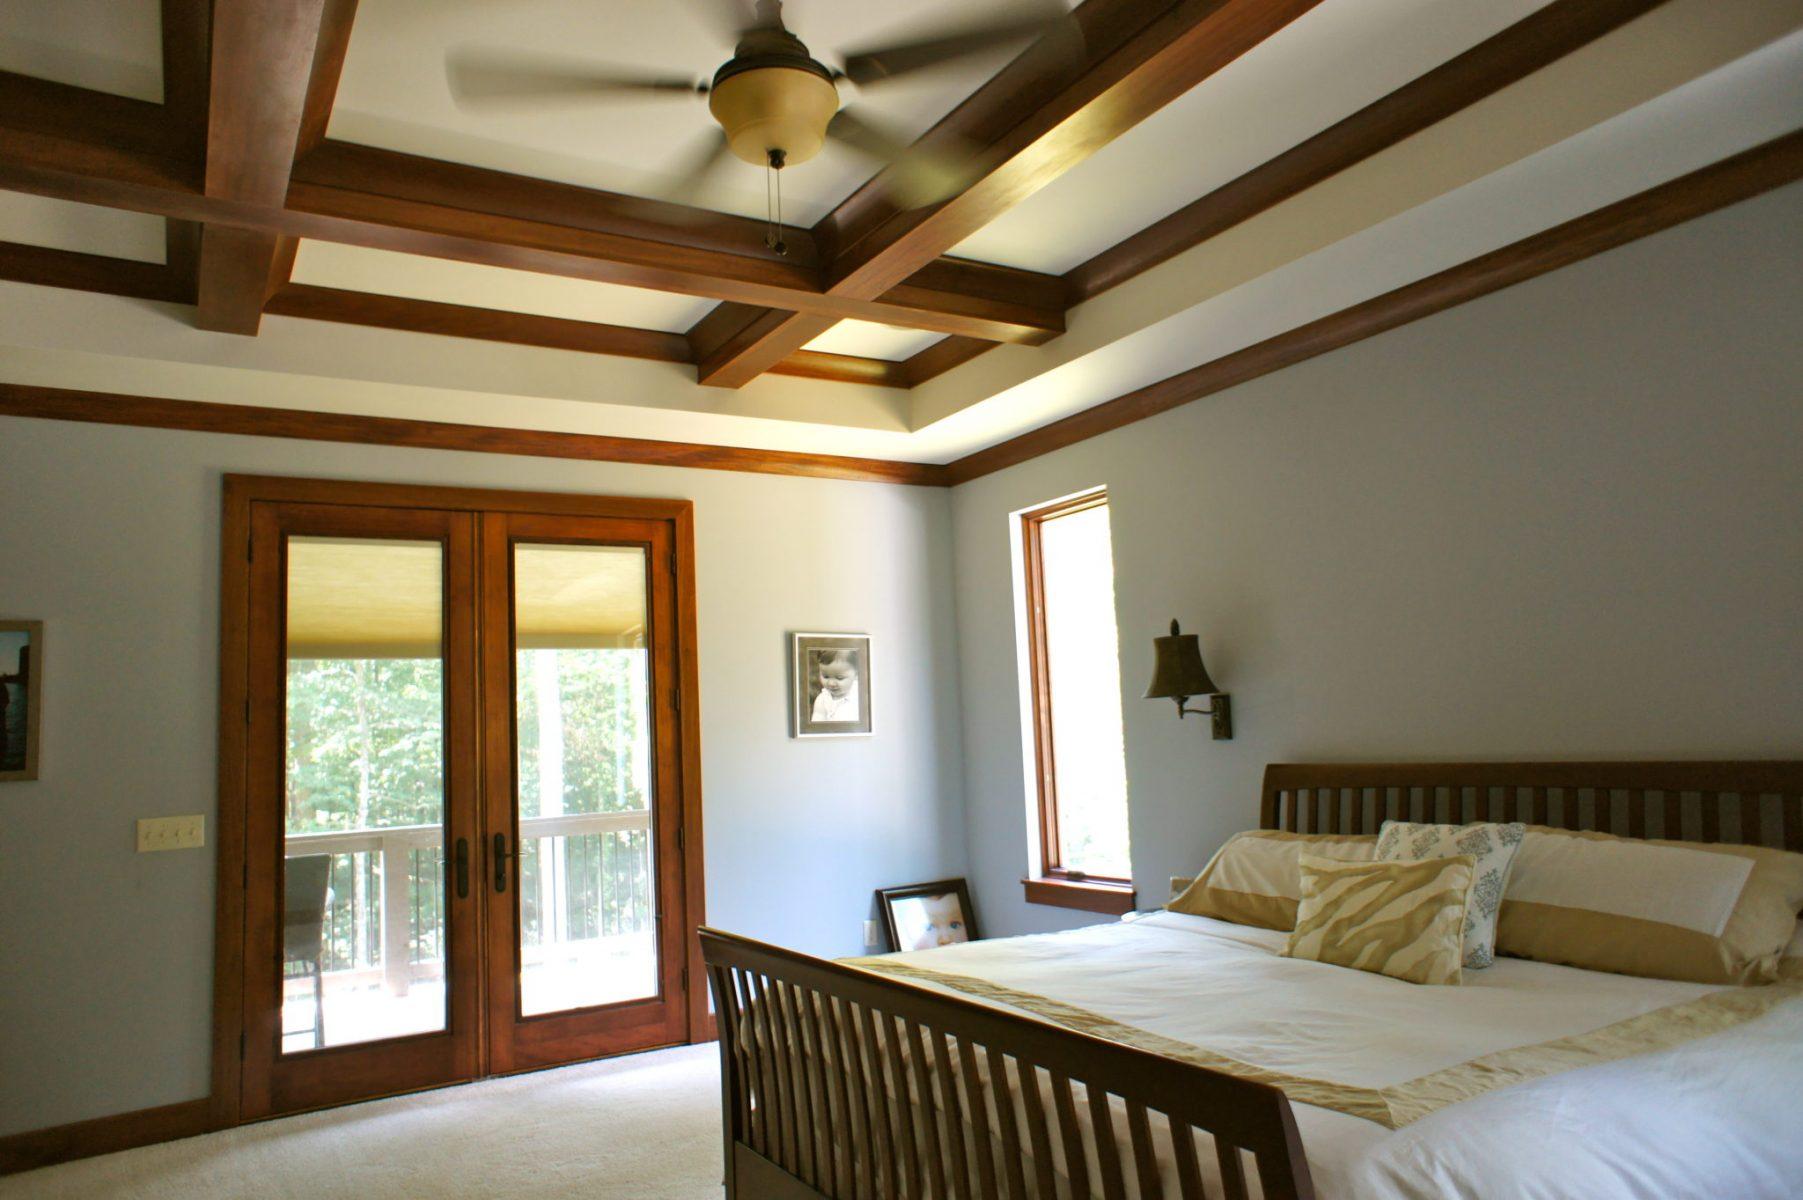 beamed ceiling